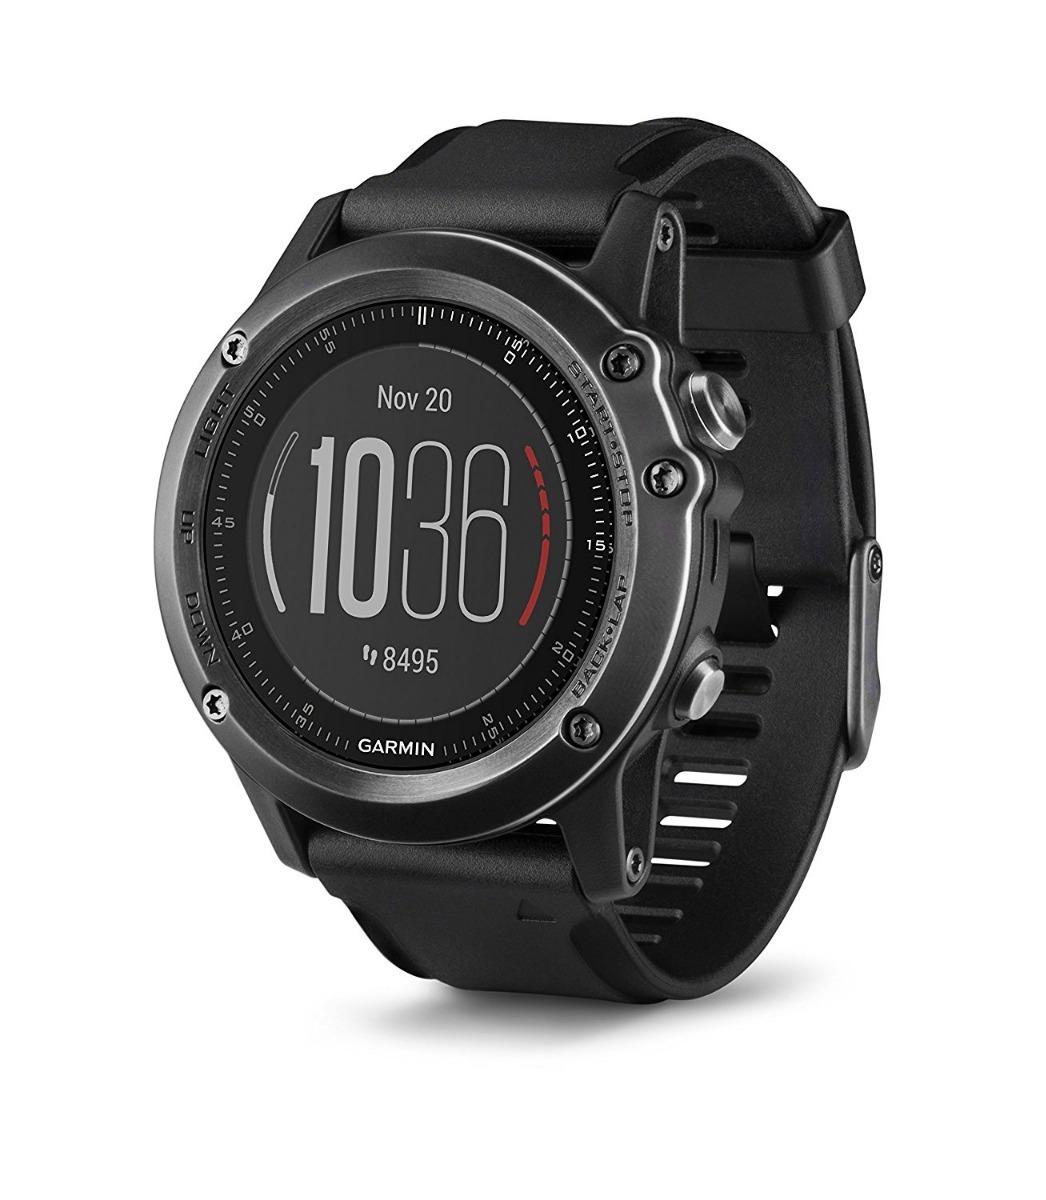 6713adca5760 reloj garmin fenix 3 hr zafiro gps altimetro barometro 100mt. Cargando zoom.